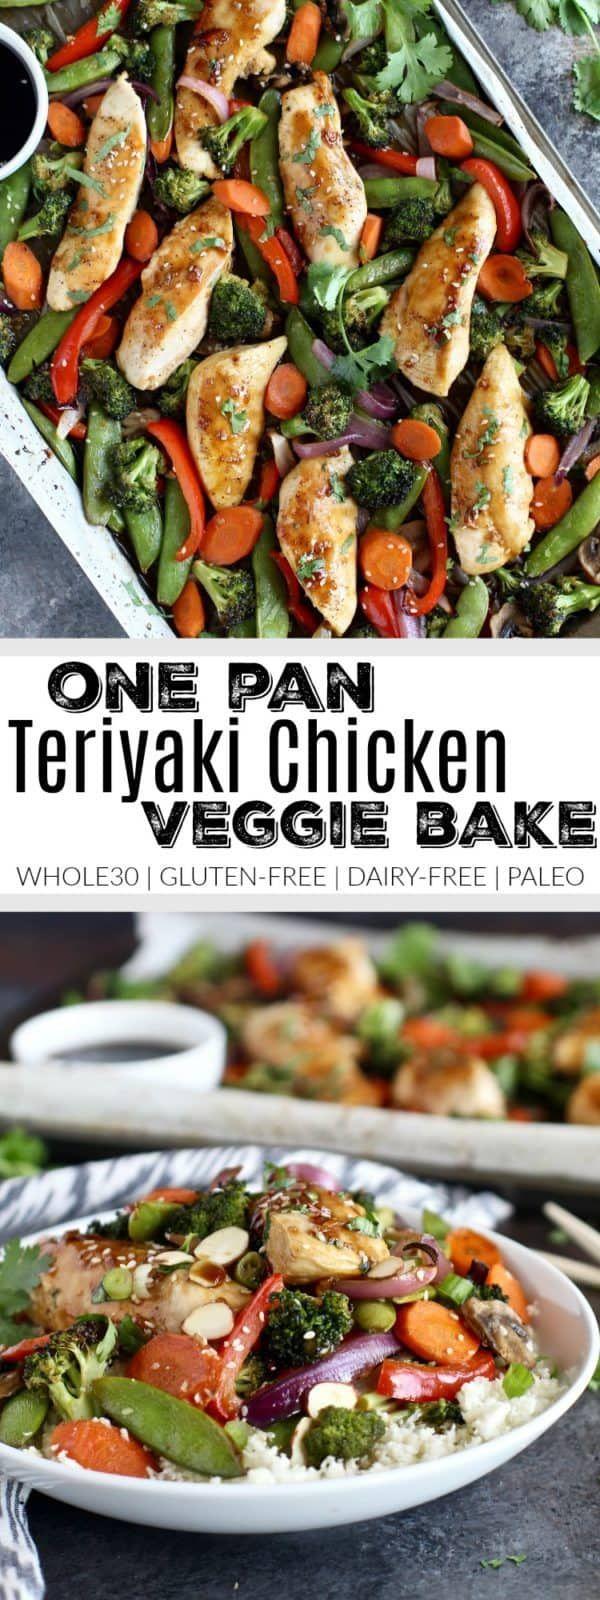 One-Pan Teriyaki Chicken Veggie Bake